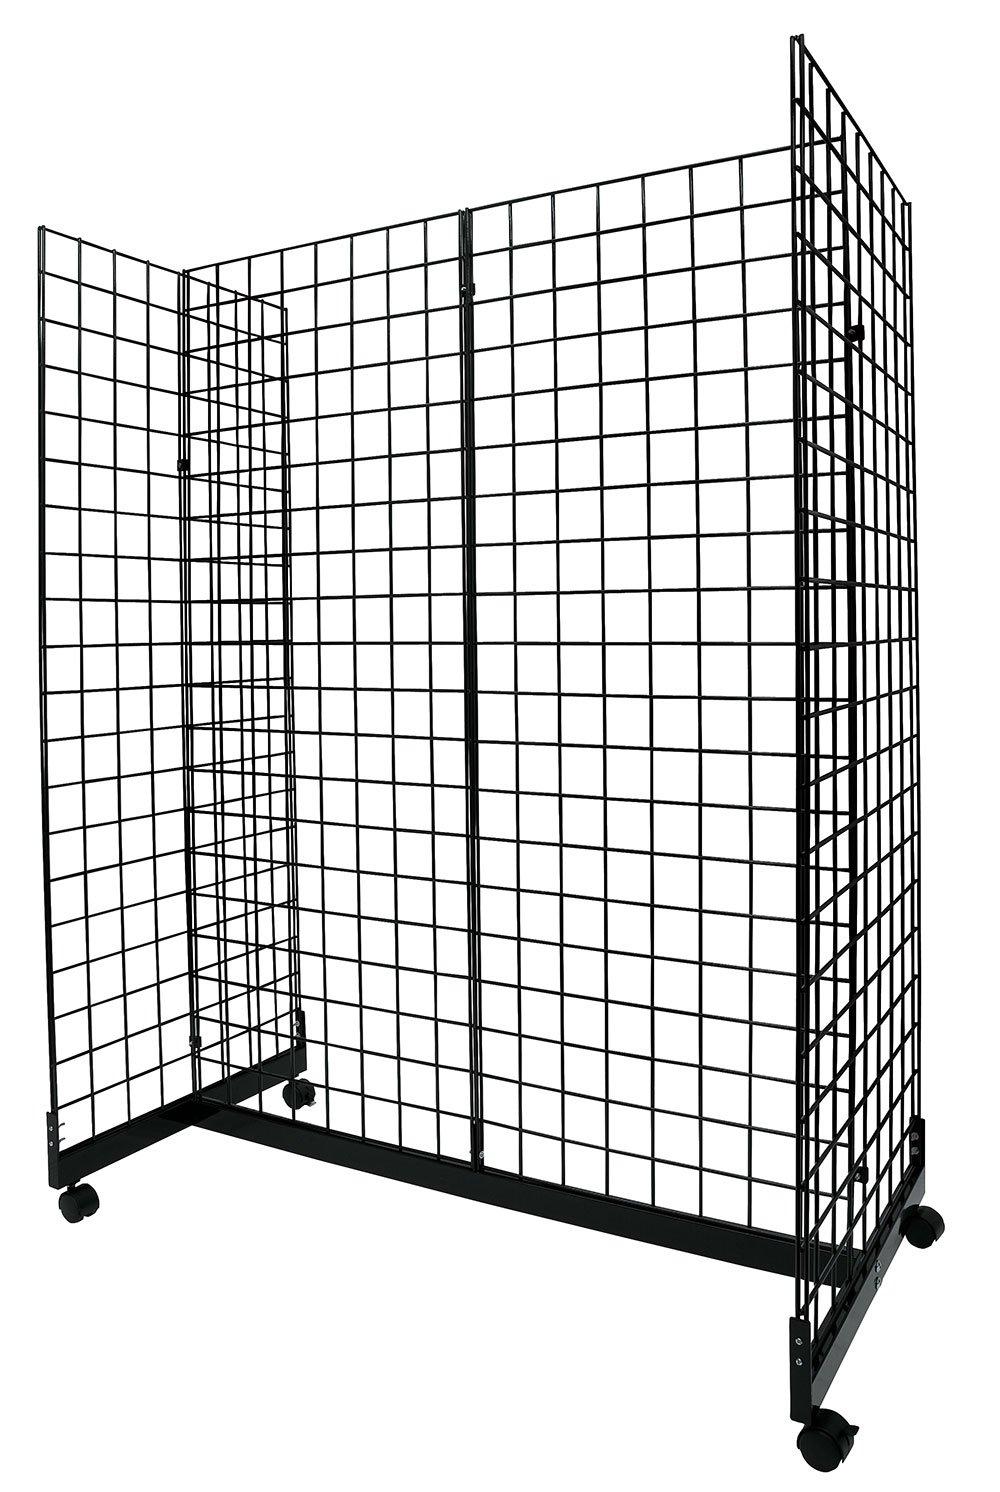 Black Grid Gondola Unit - Includes Base and Casters - Grid Unit 48''L x 66''H x 24''W by SSWBasics (Image #1)